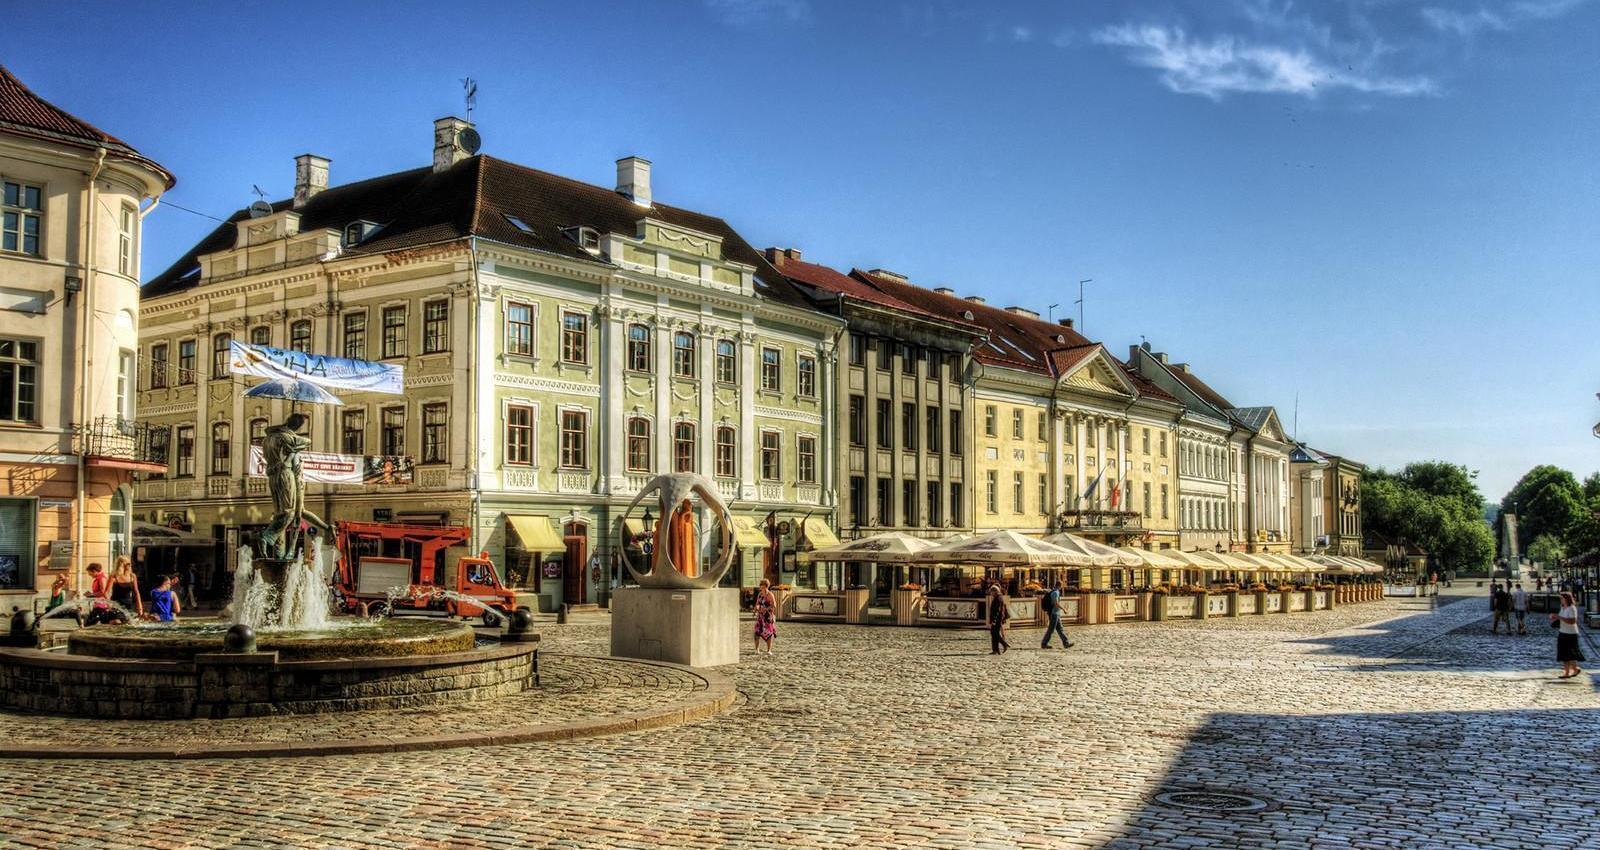 03_where_to_go_south_estonia_tartu_by_neil_howard